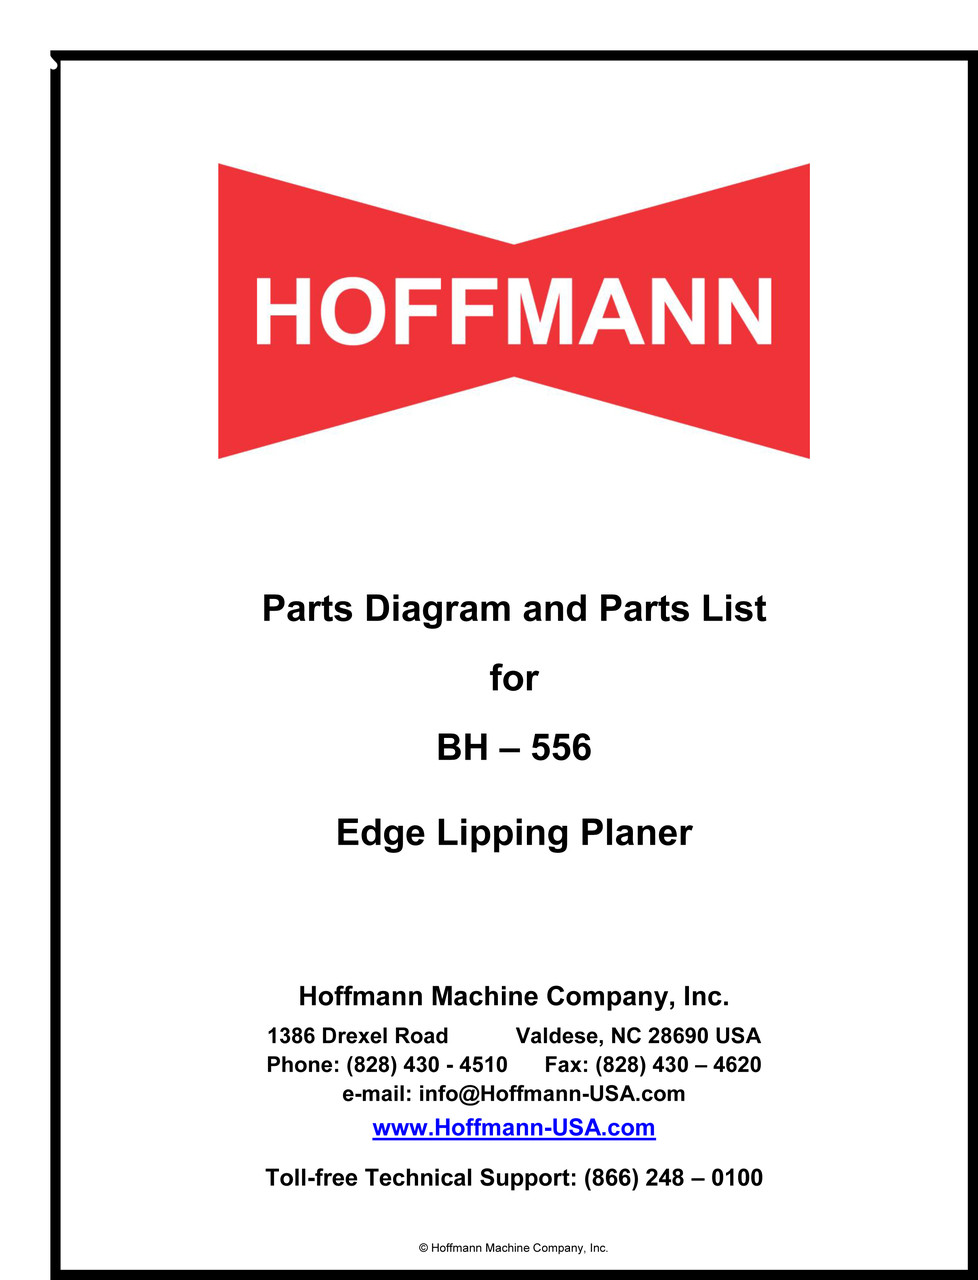 BH-556 Parts Diagram and Parts List